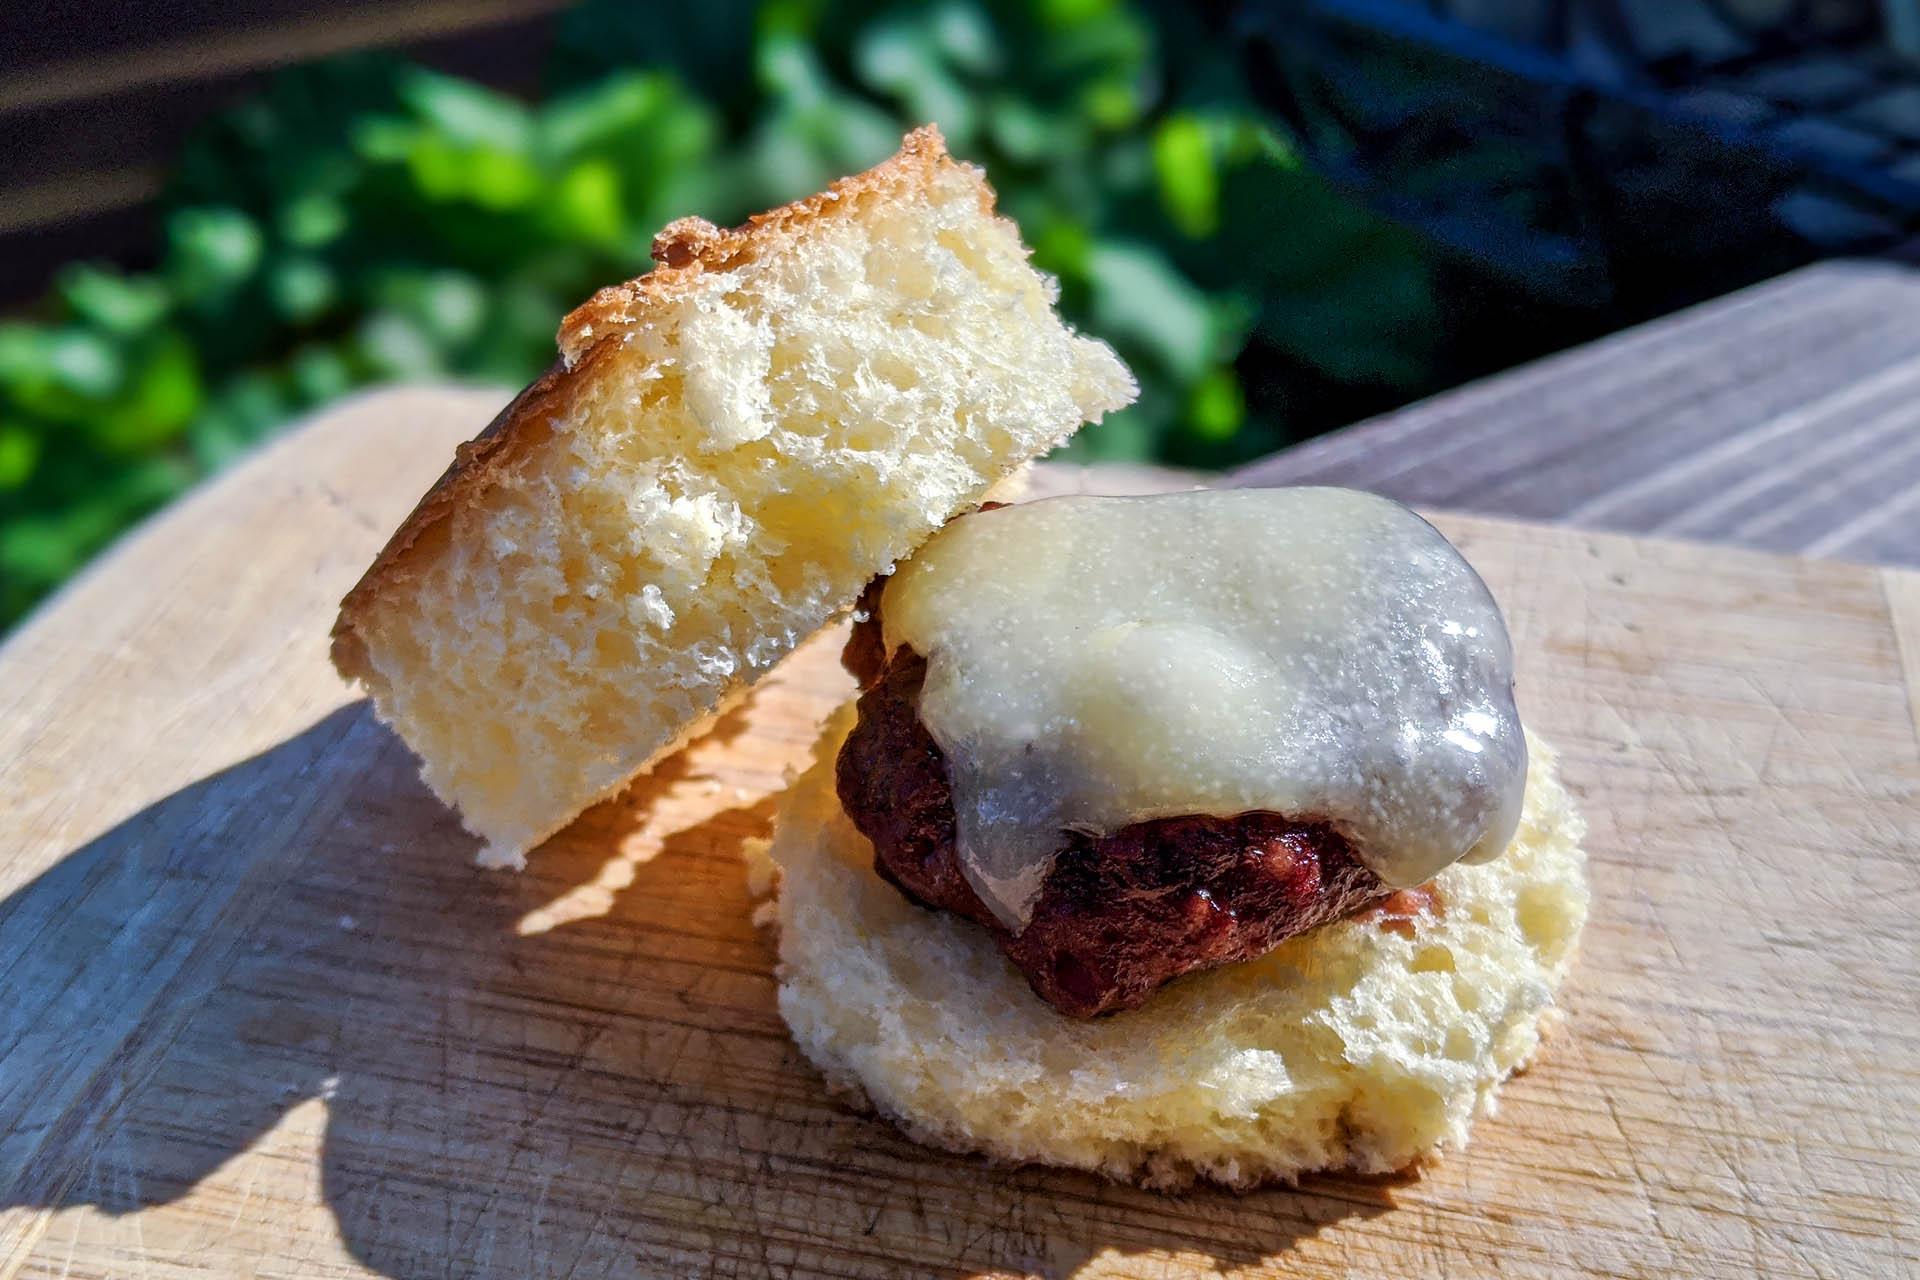 Bison burger on sourdough